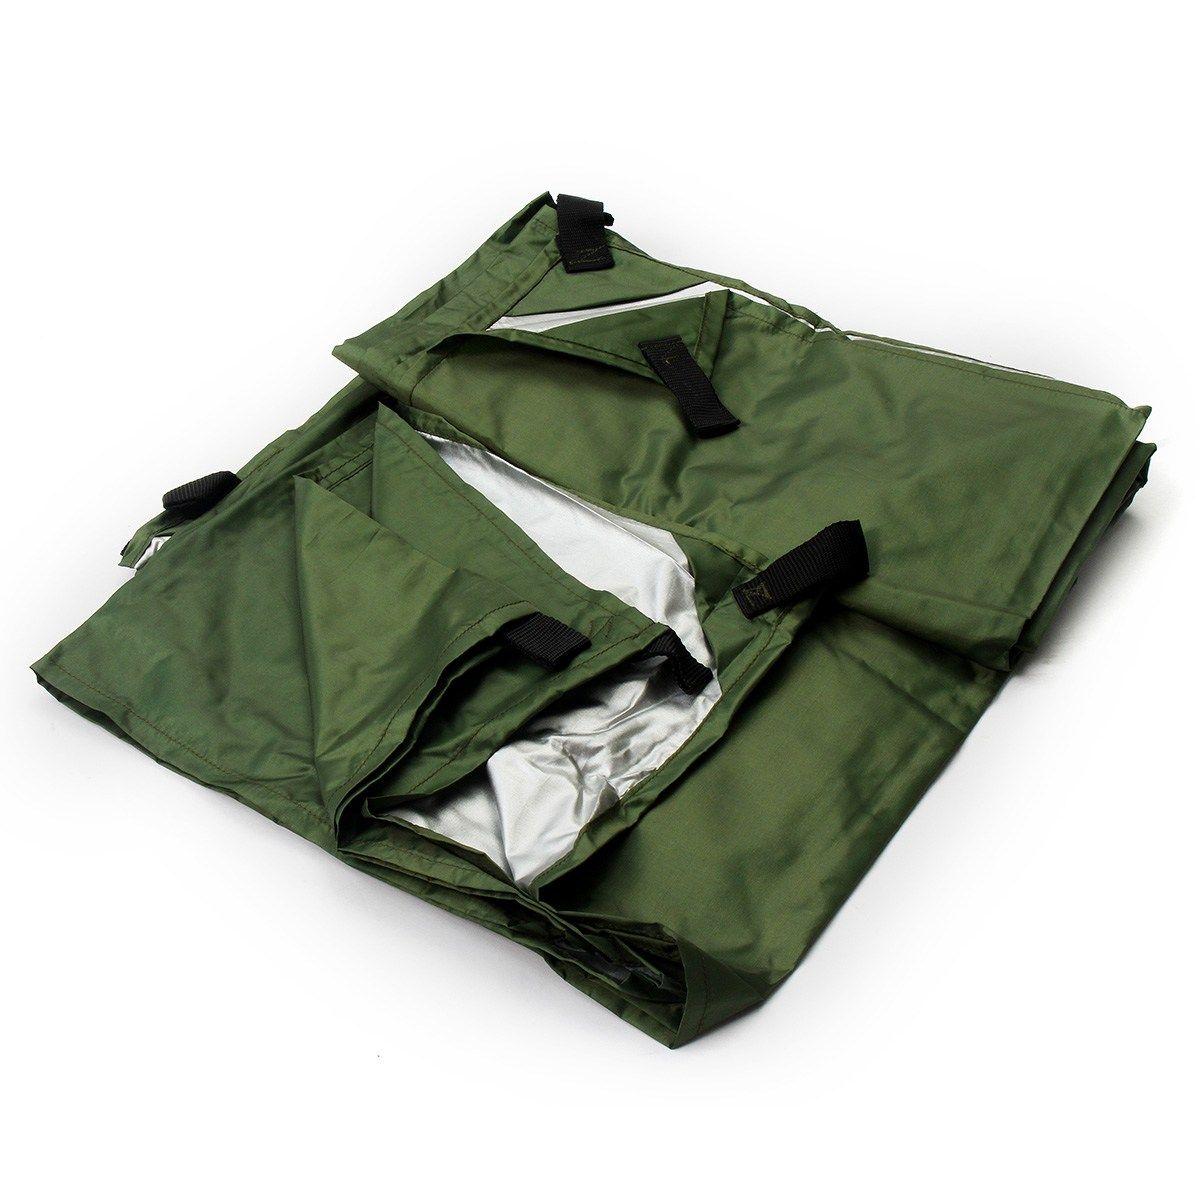 3mx3m Waterproof Sun Shelter Tarp Survival Camping Climbing Outdoor Tent Patio Sun Shade Awning Canopy Garden tent Shade